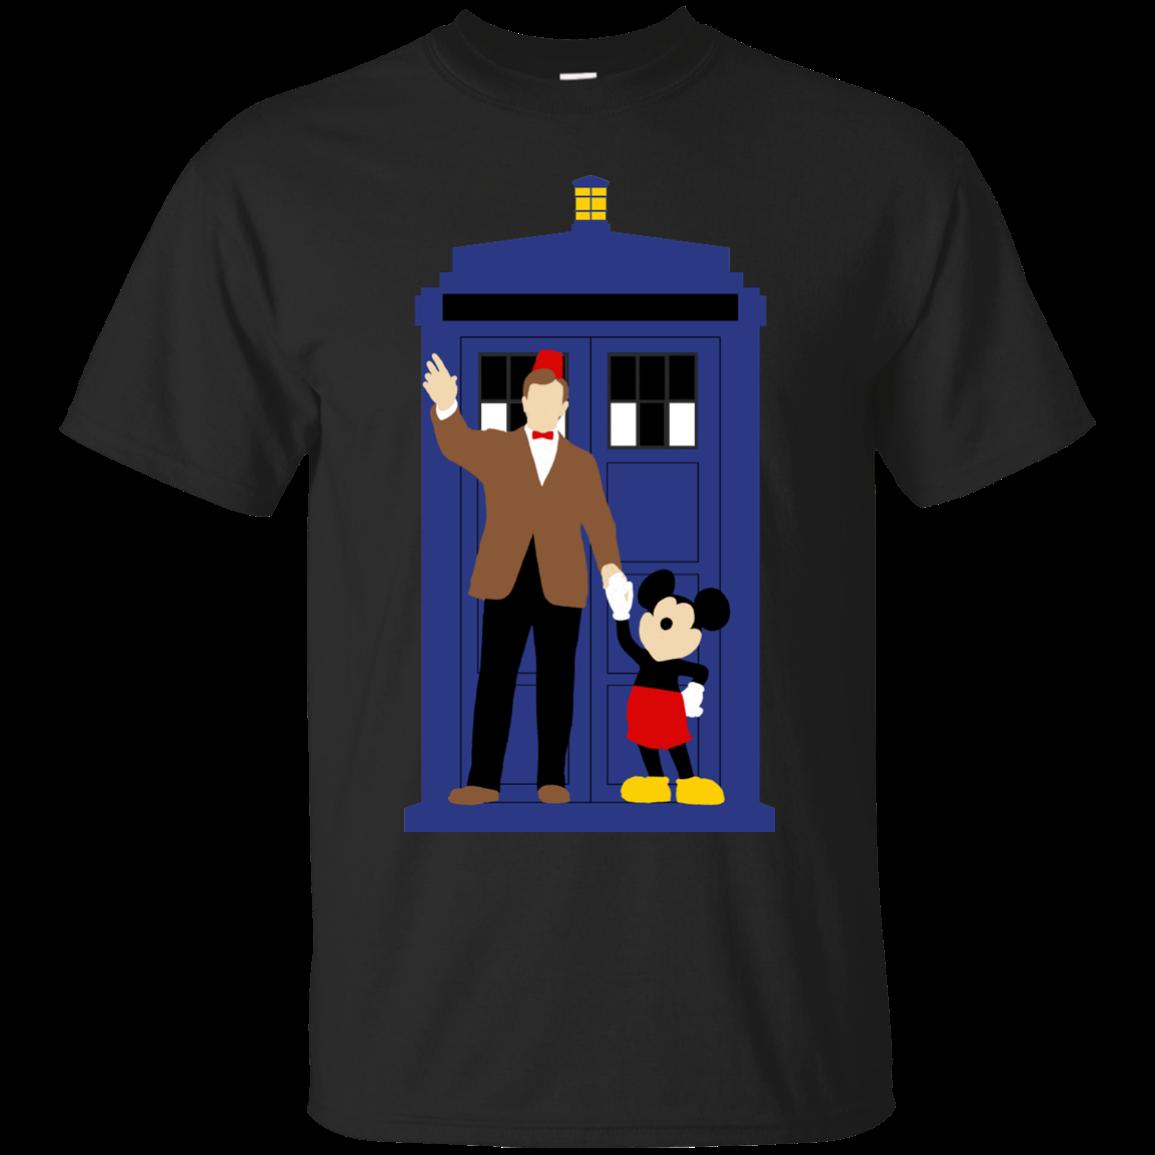 Imagine The Adventures T Shirt